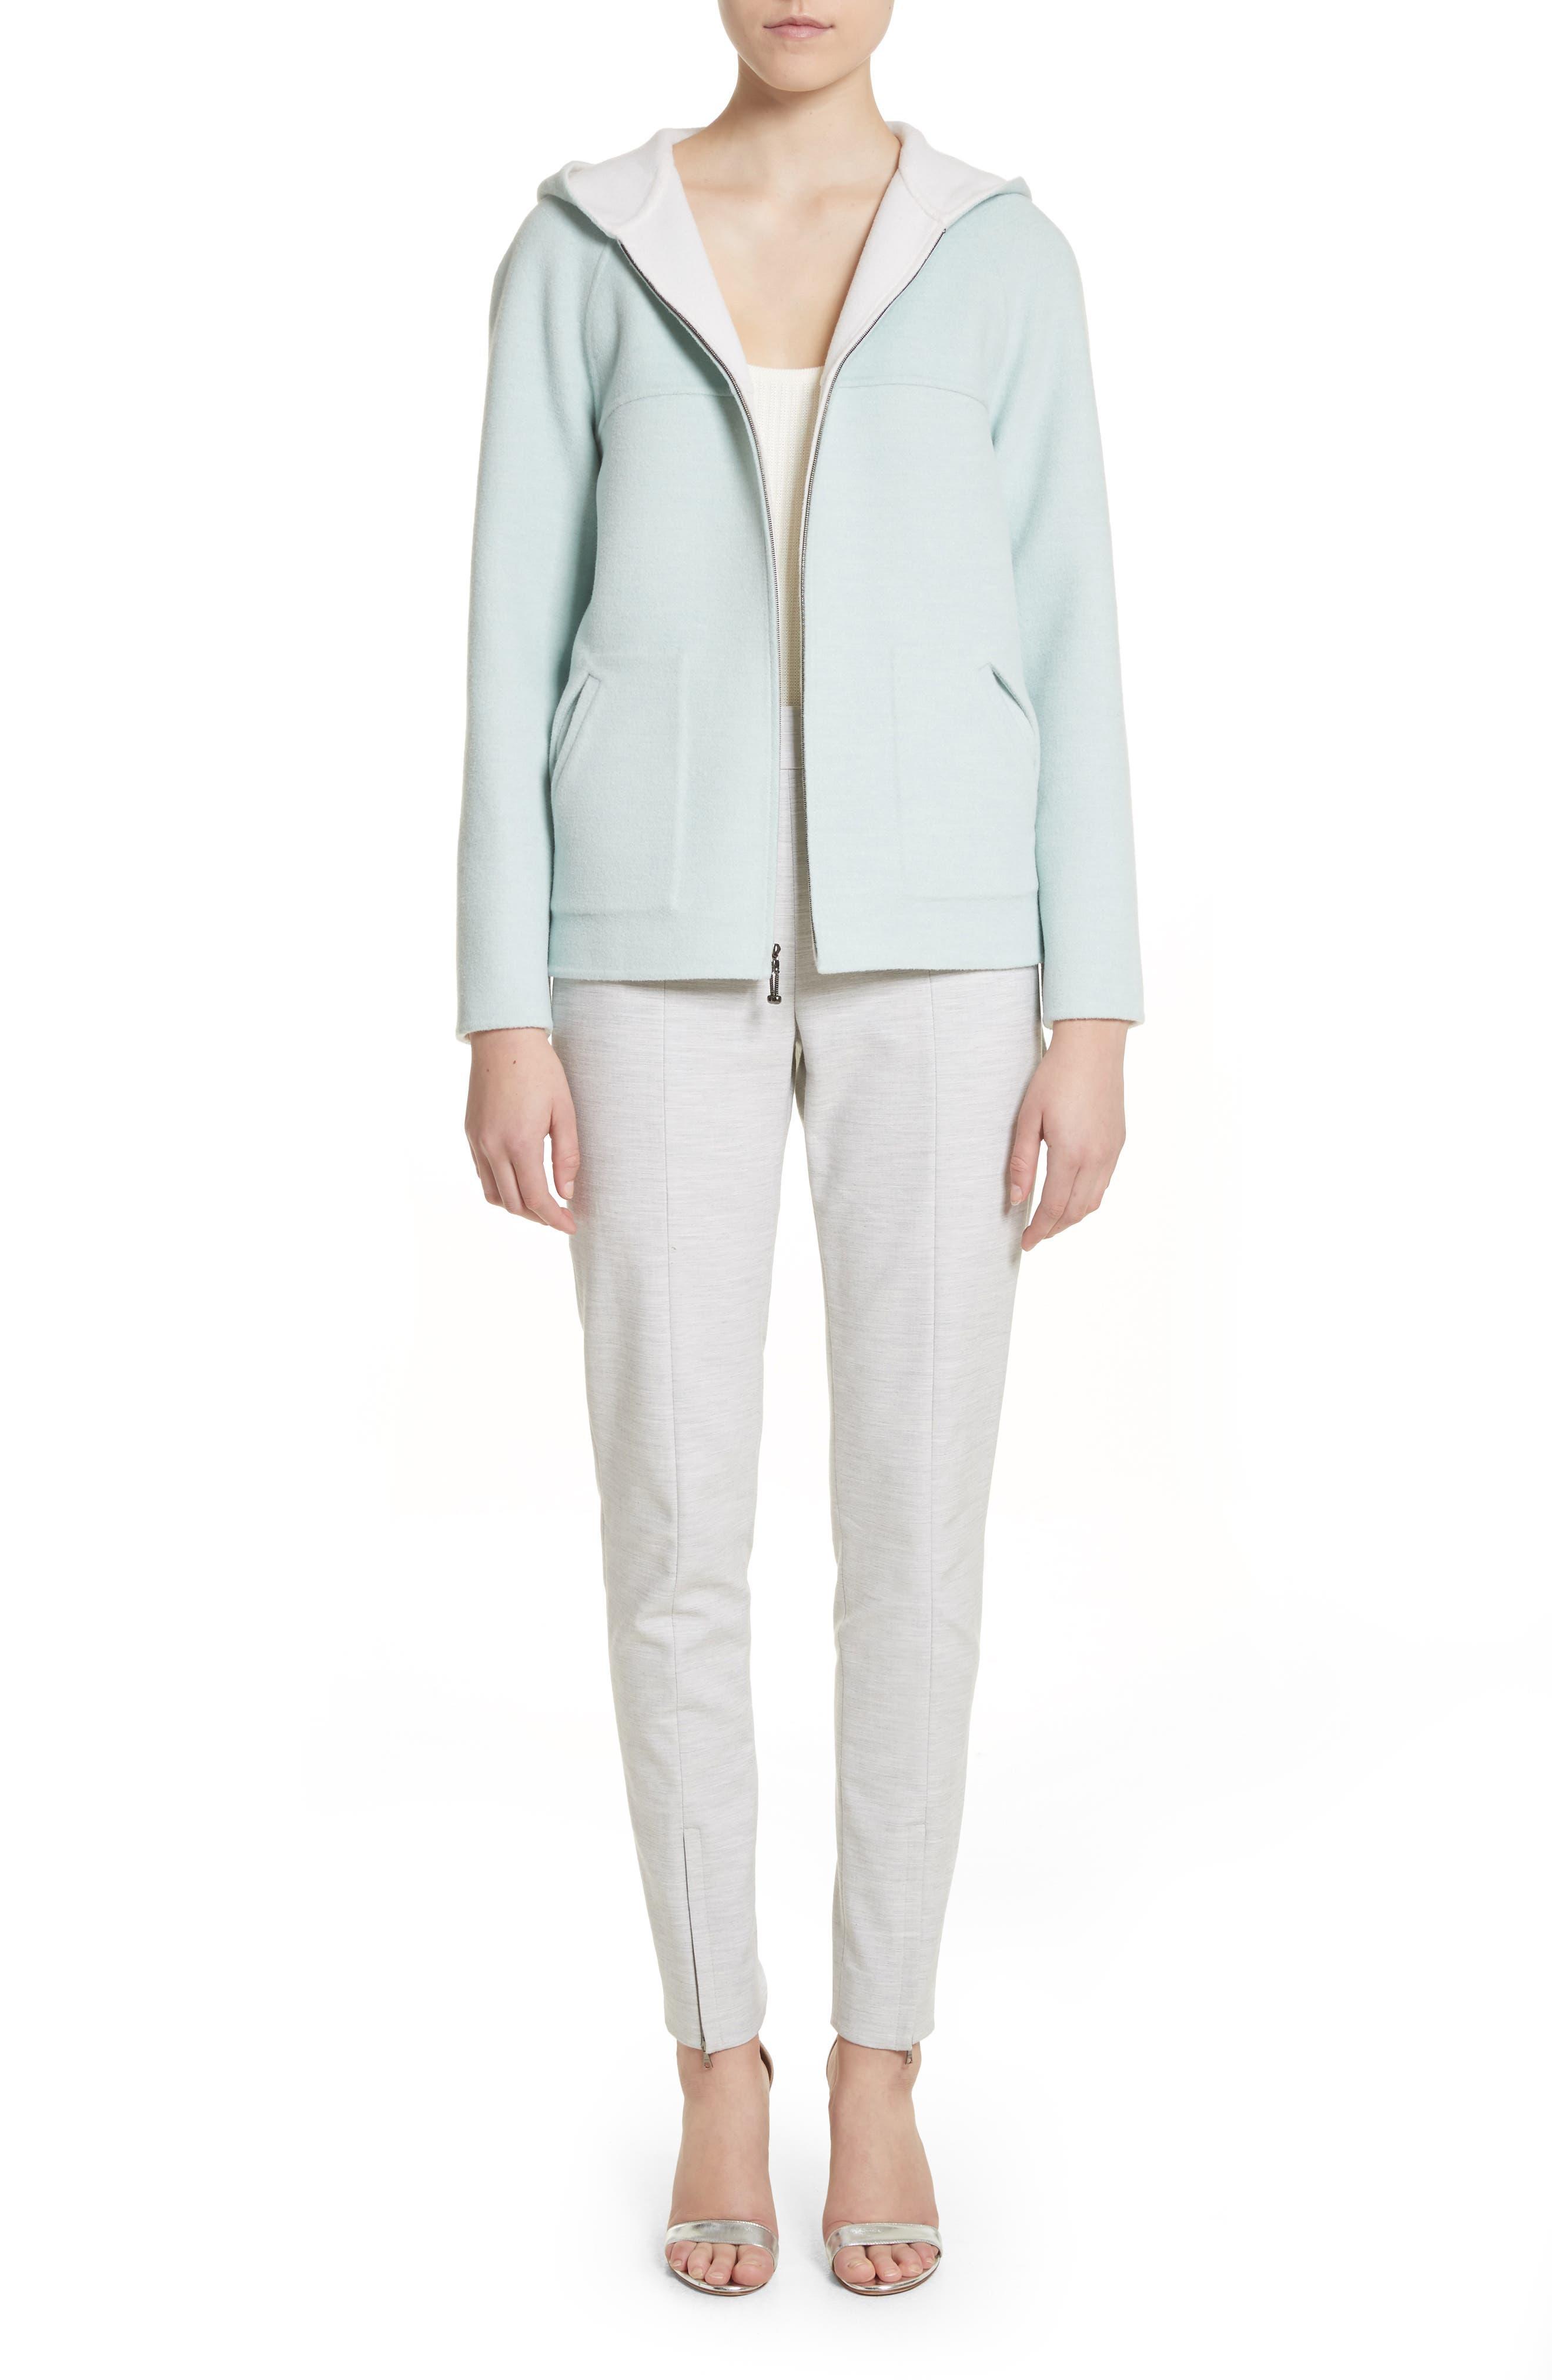 Summer Bella Double Weave Pants,                             Alternate thumbnail 4, color,                             Light Grey Melange